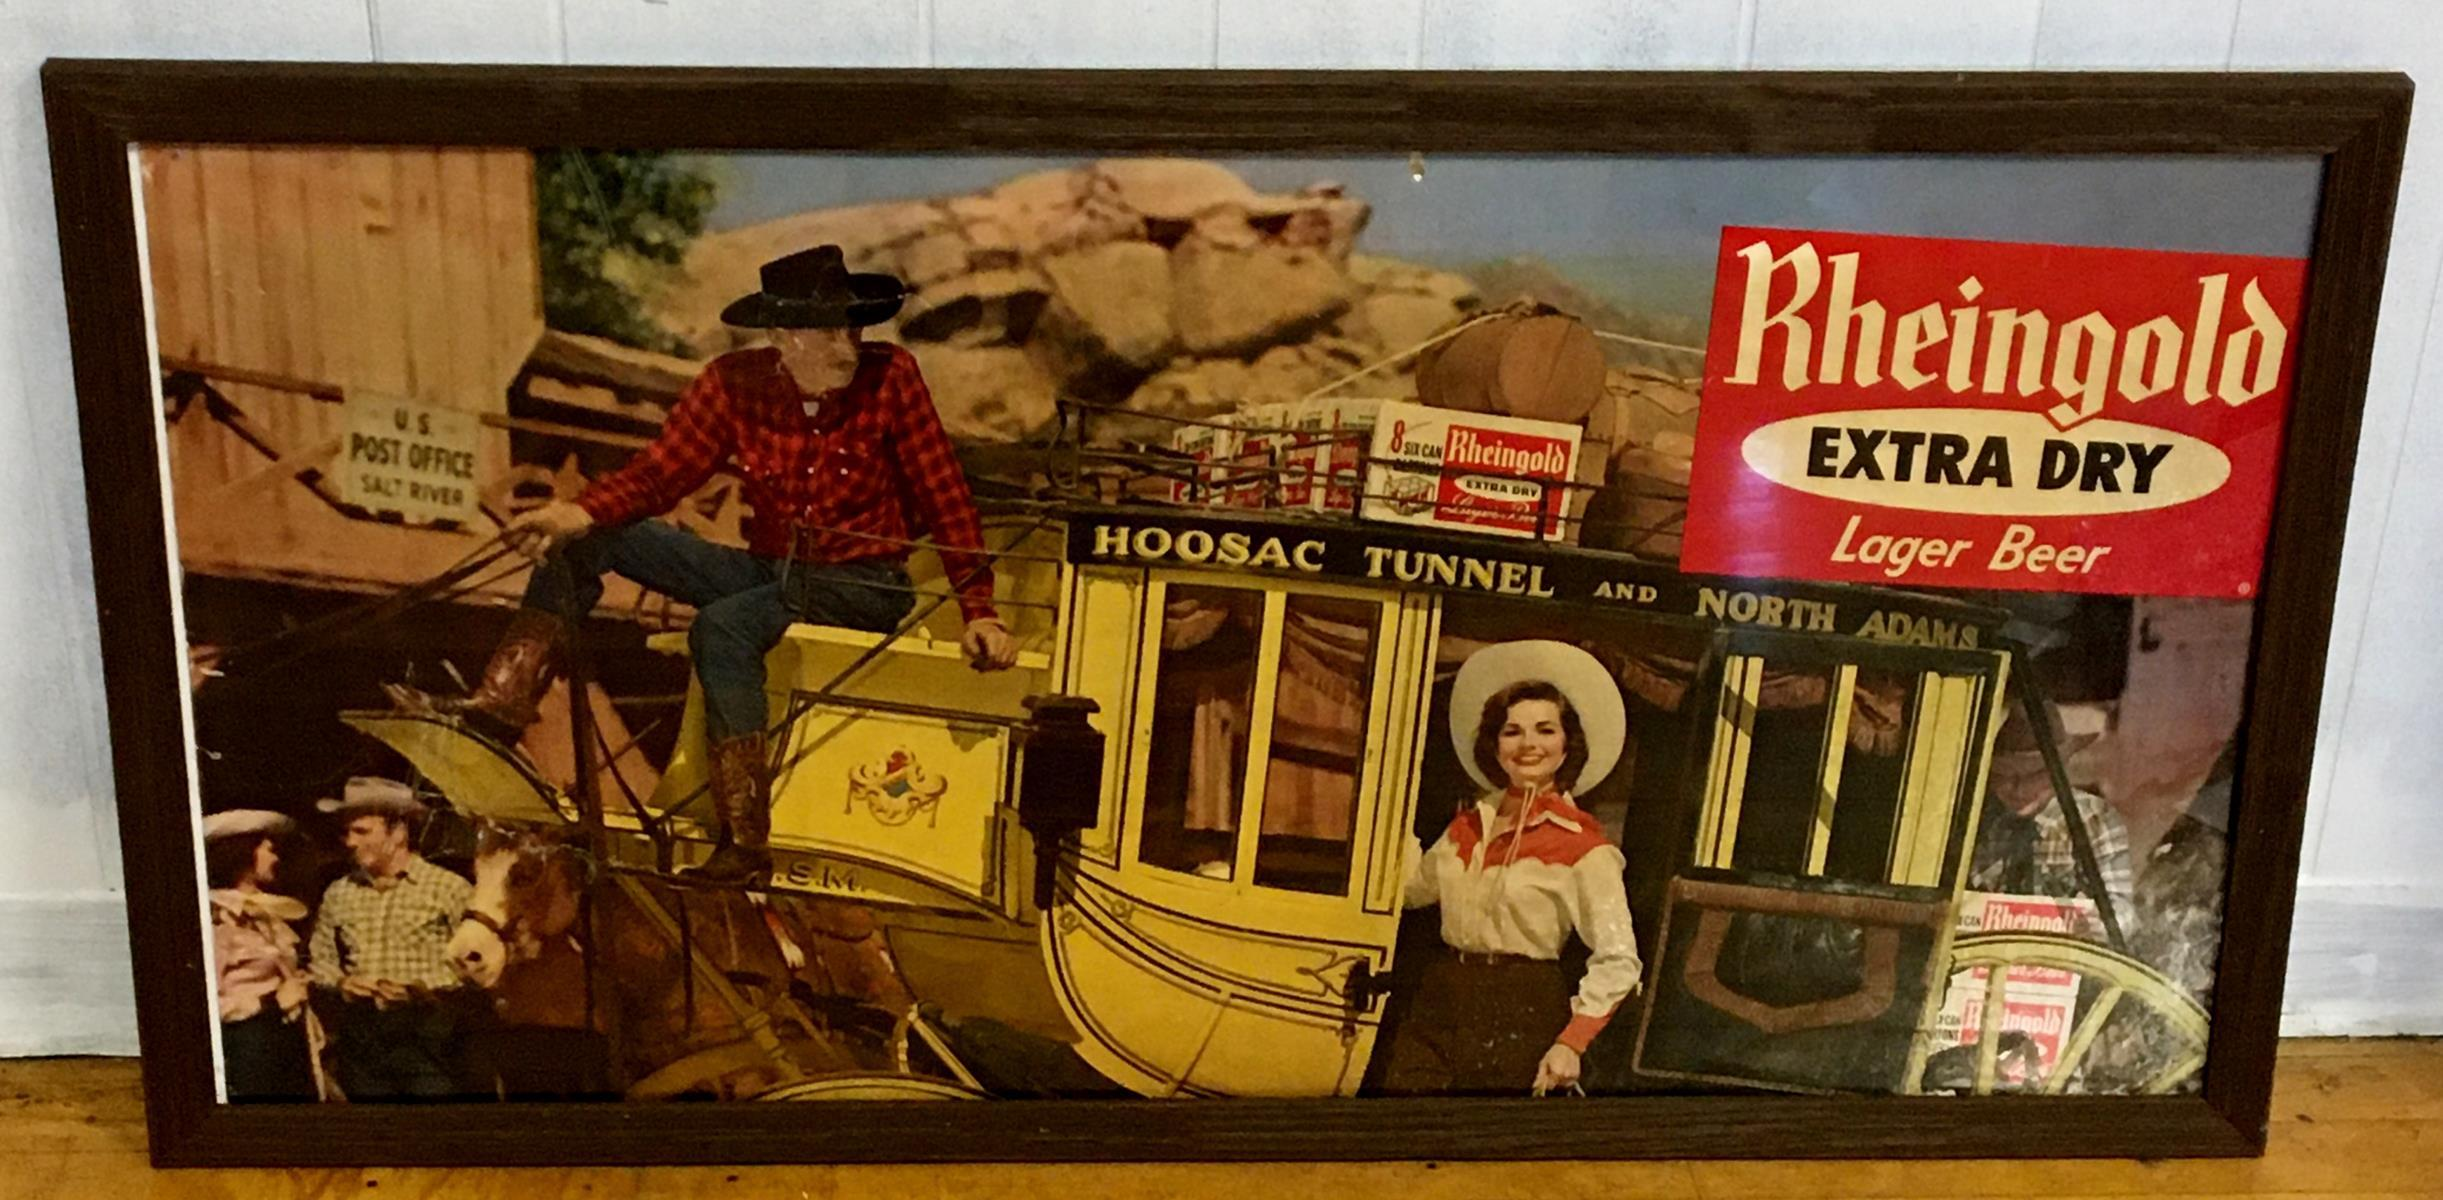 RARE Vintage 1958 Rheingold Extra Dry Lager Beer Miss Rheingold Madelyn Darron Heavy Stock Sign FRAMED